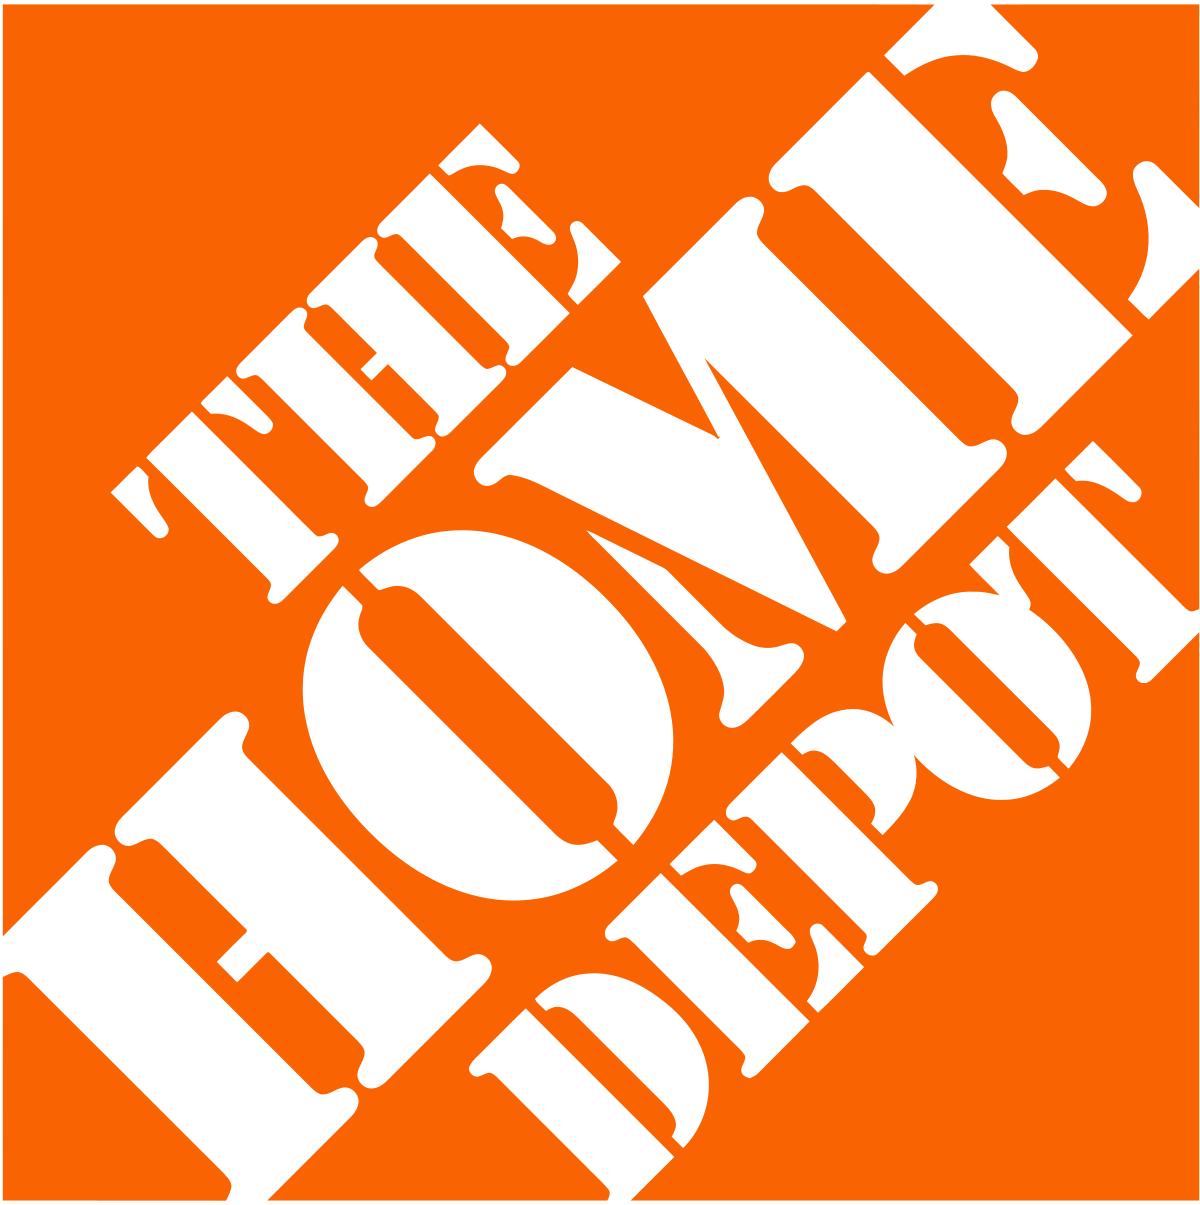 The Home Depot: 1 Mensualidad de Bonificación en Compras 12 meses con HSBC